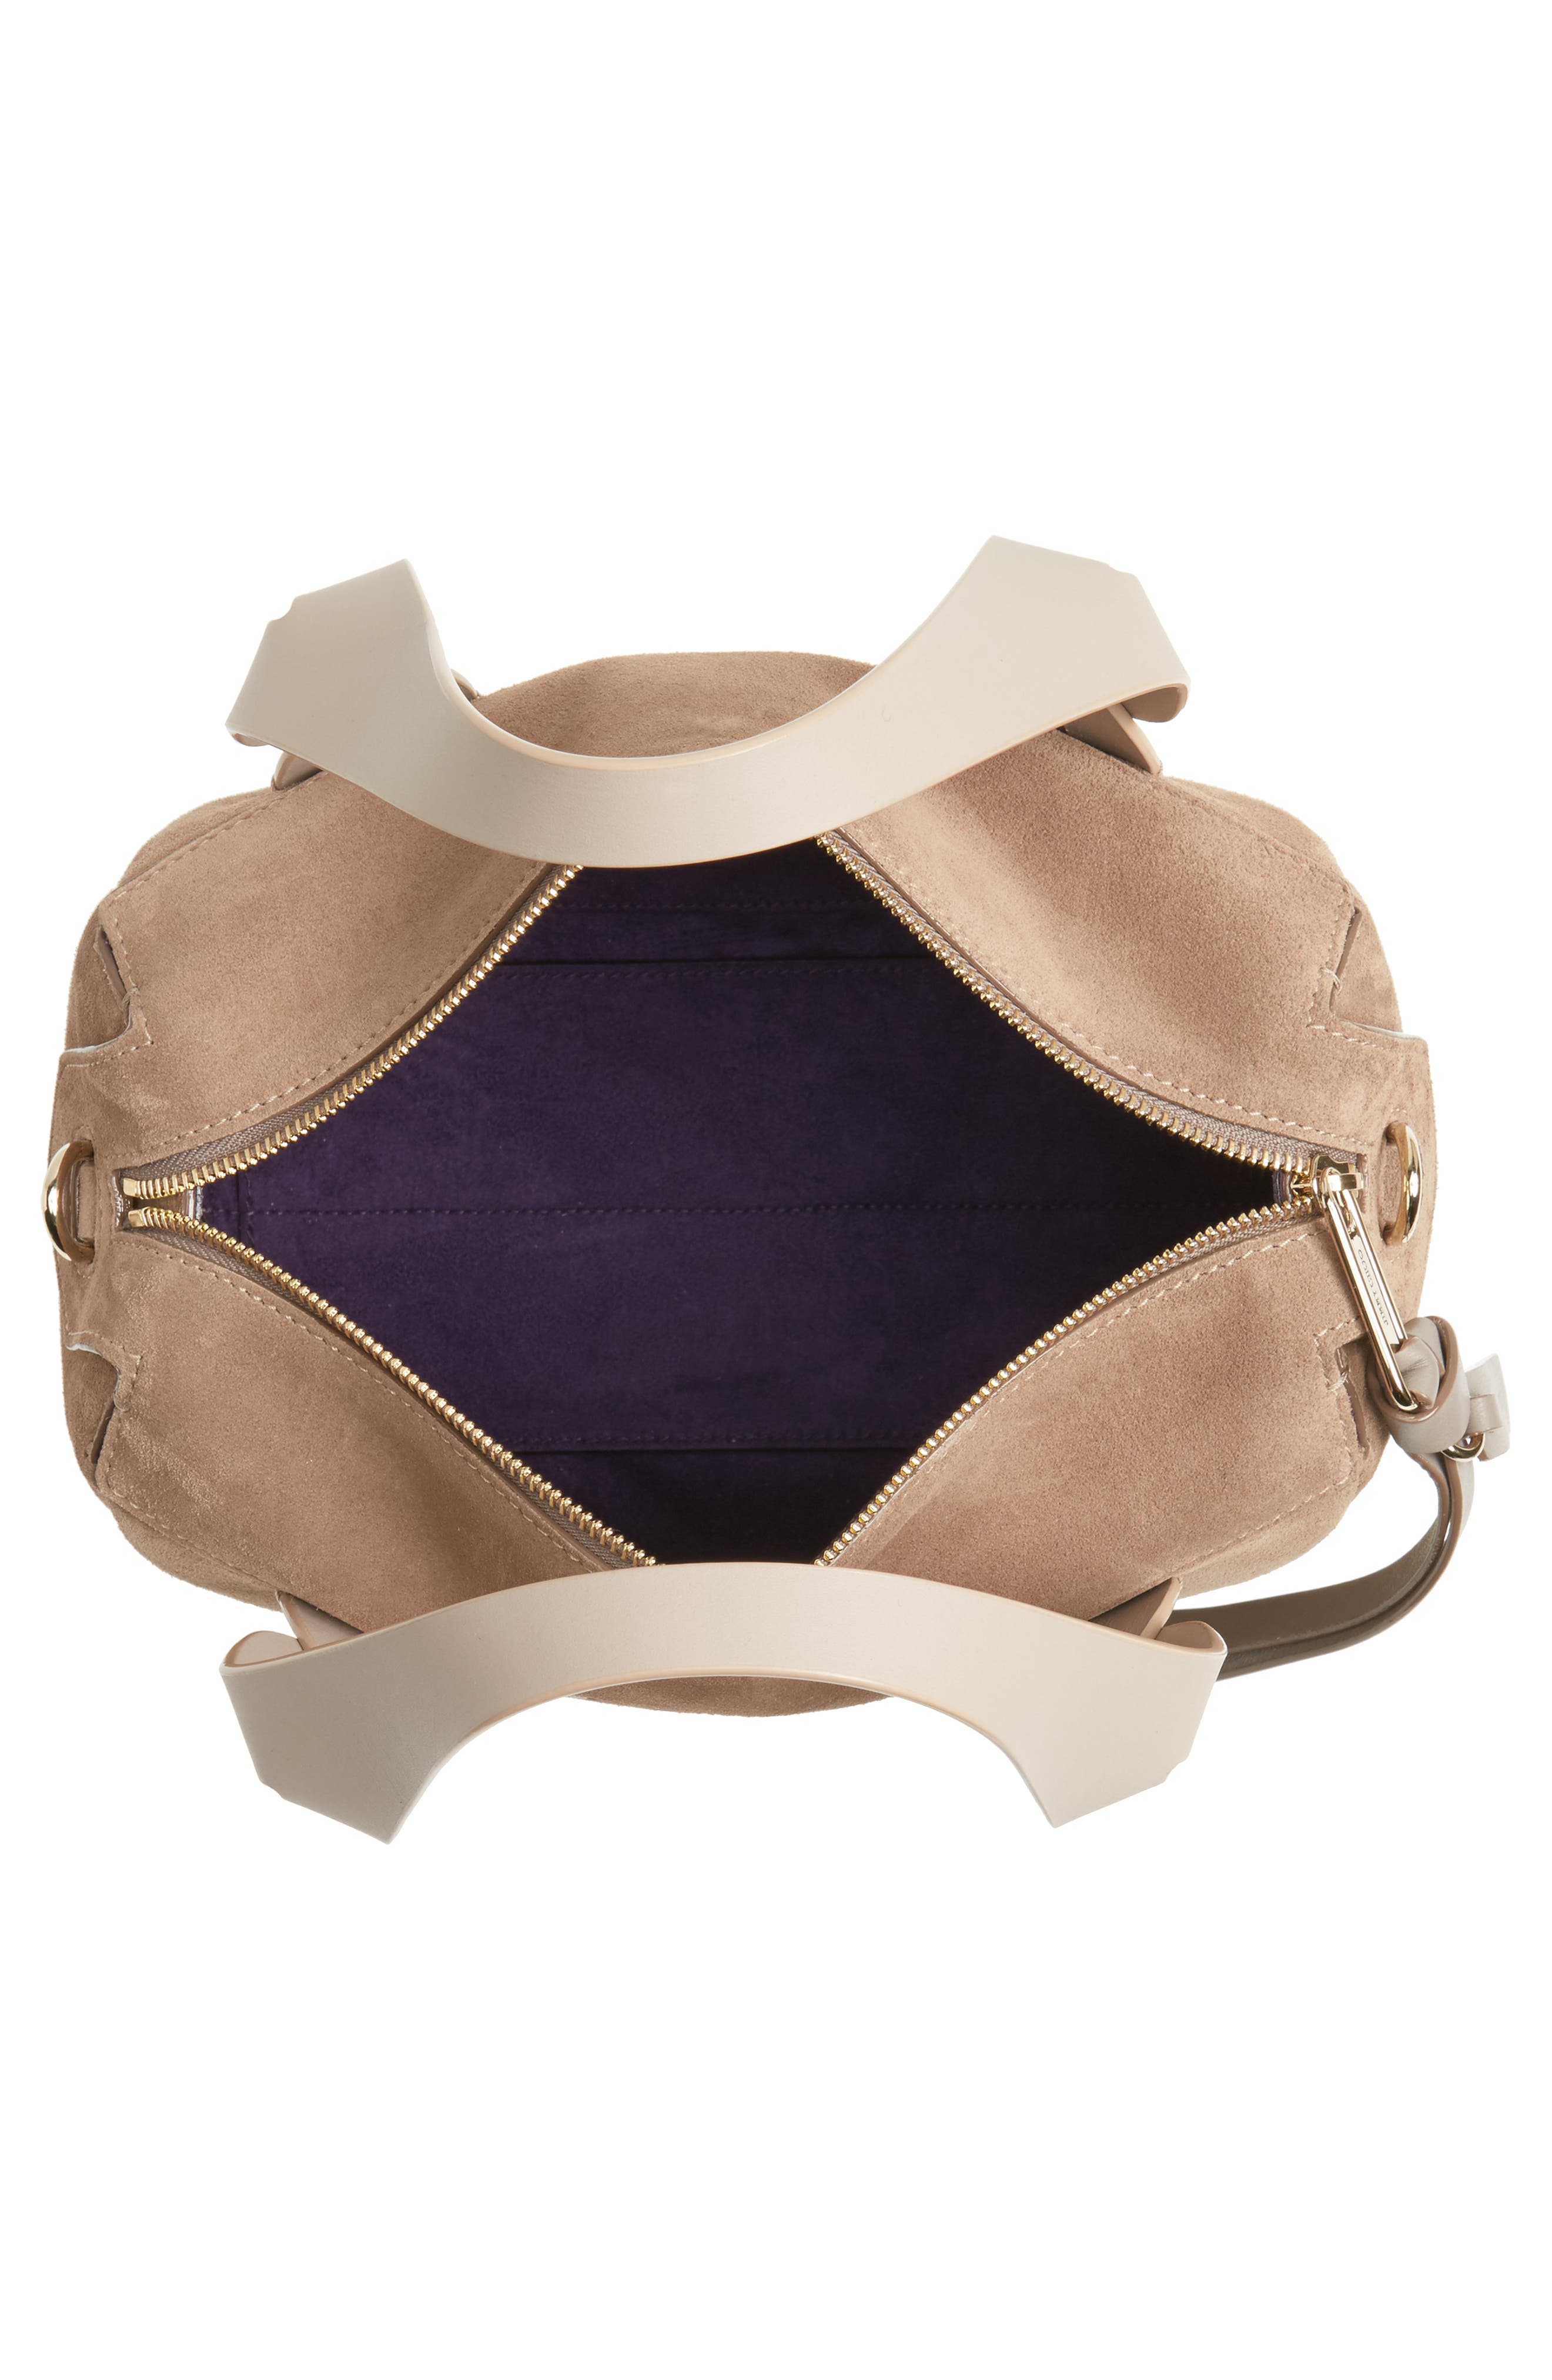 Small Allie Nappa Leather Bowling Bag,                             Alternate thumbnail 4, color,                             Light Mocha